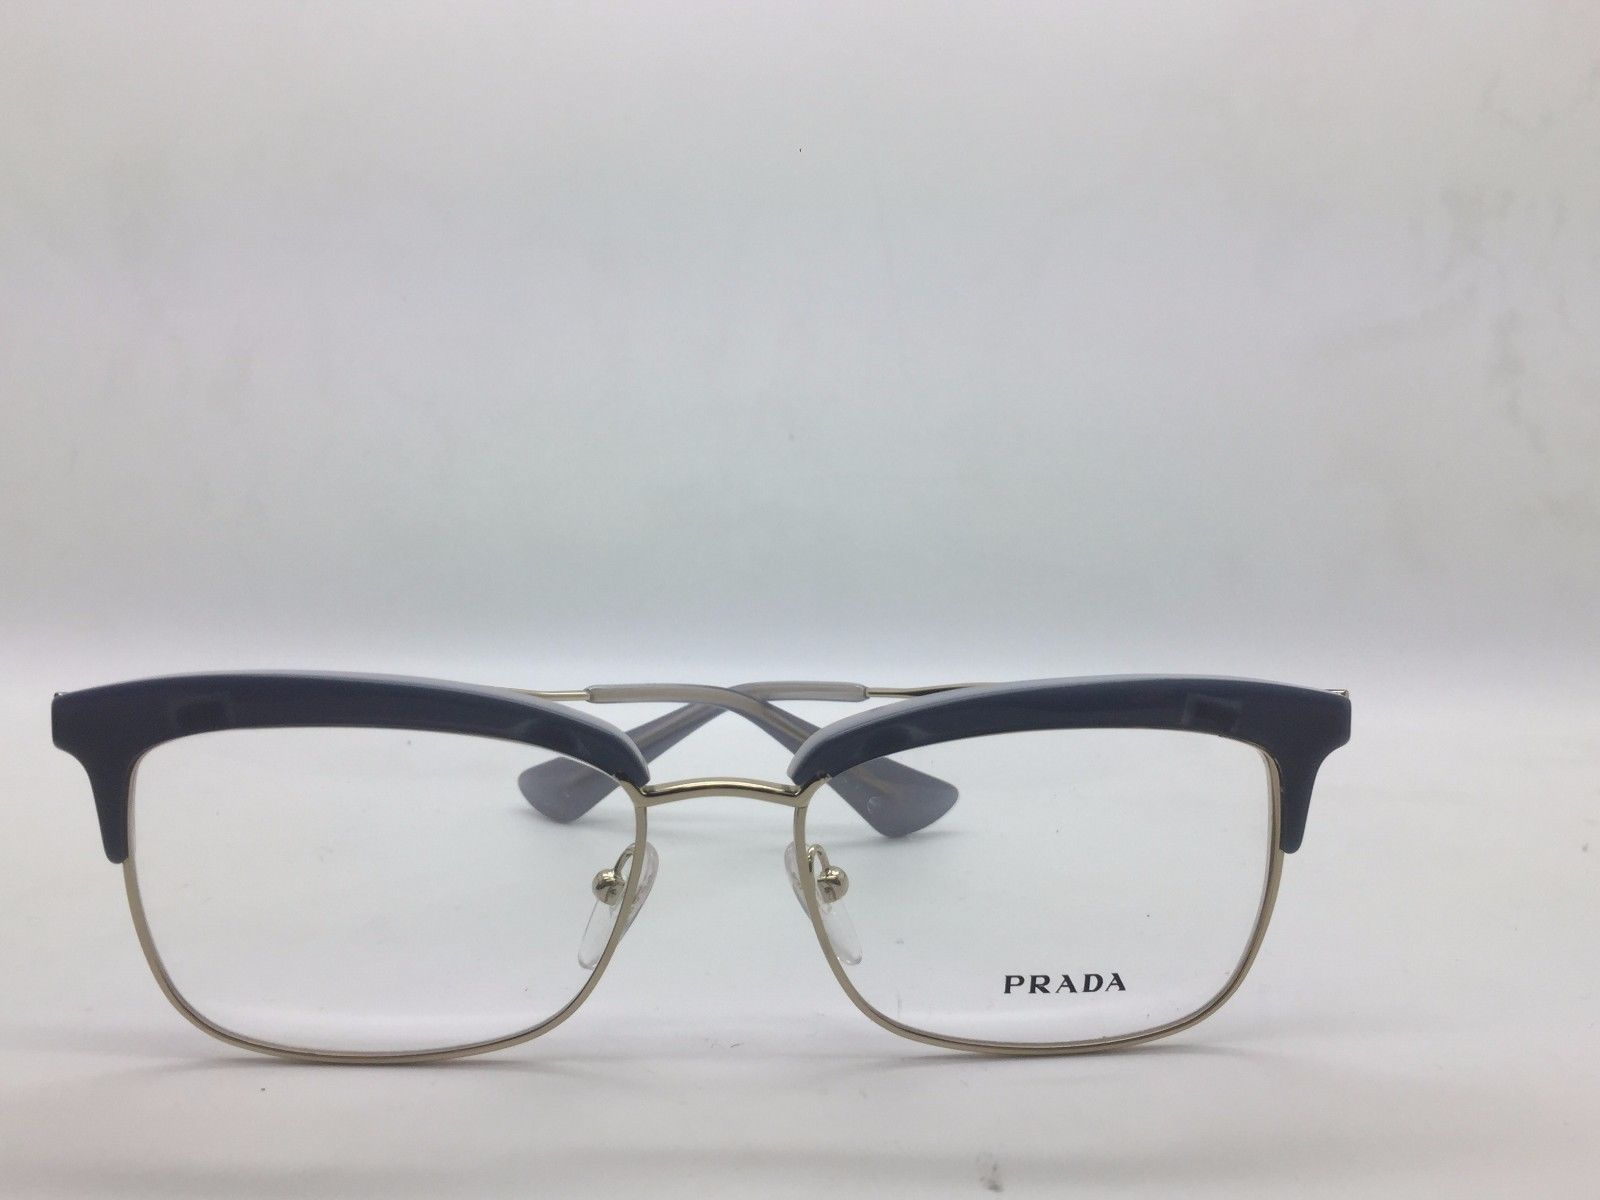 eb156f35af Prada VPR 08S UEE-1O1 Blue on Gold New Authentic Eyeglasses 55 17